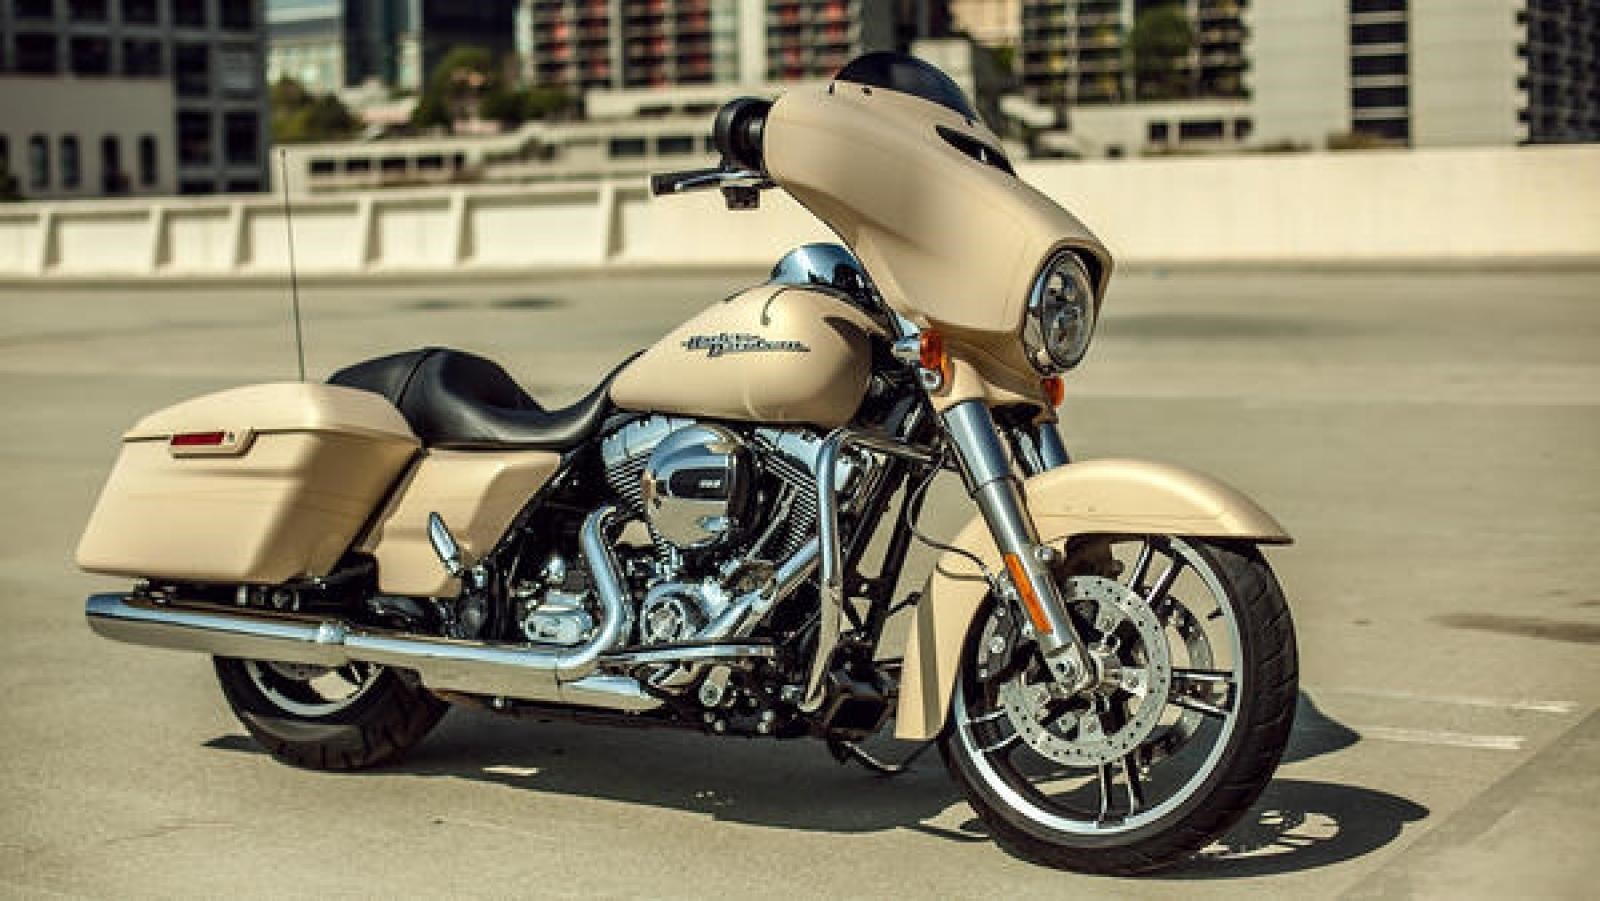 2014 Harley Davidson 174 Flhxs Street Glide 174 Special Sand